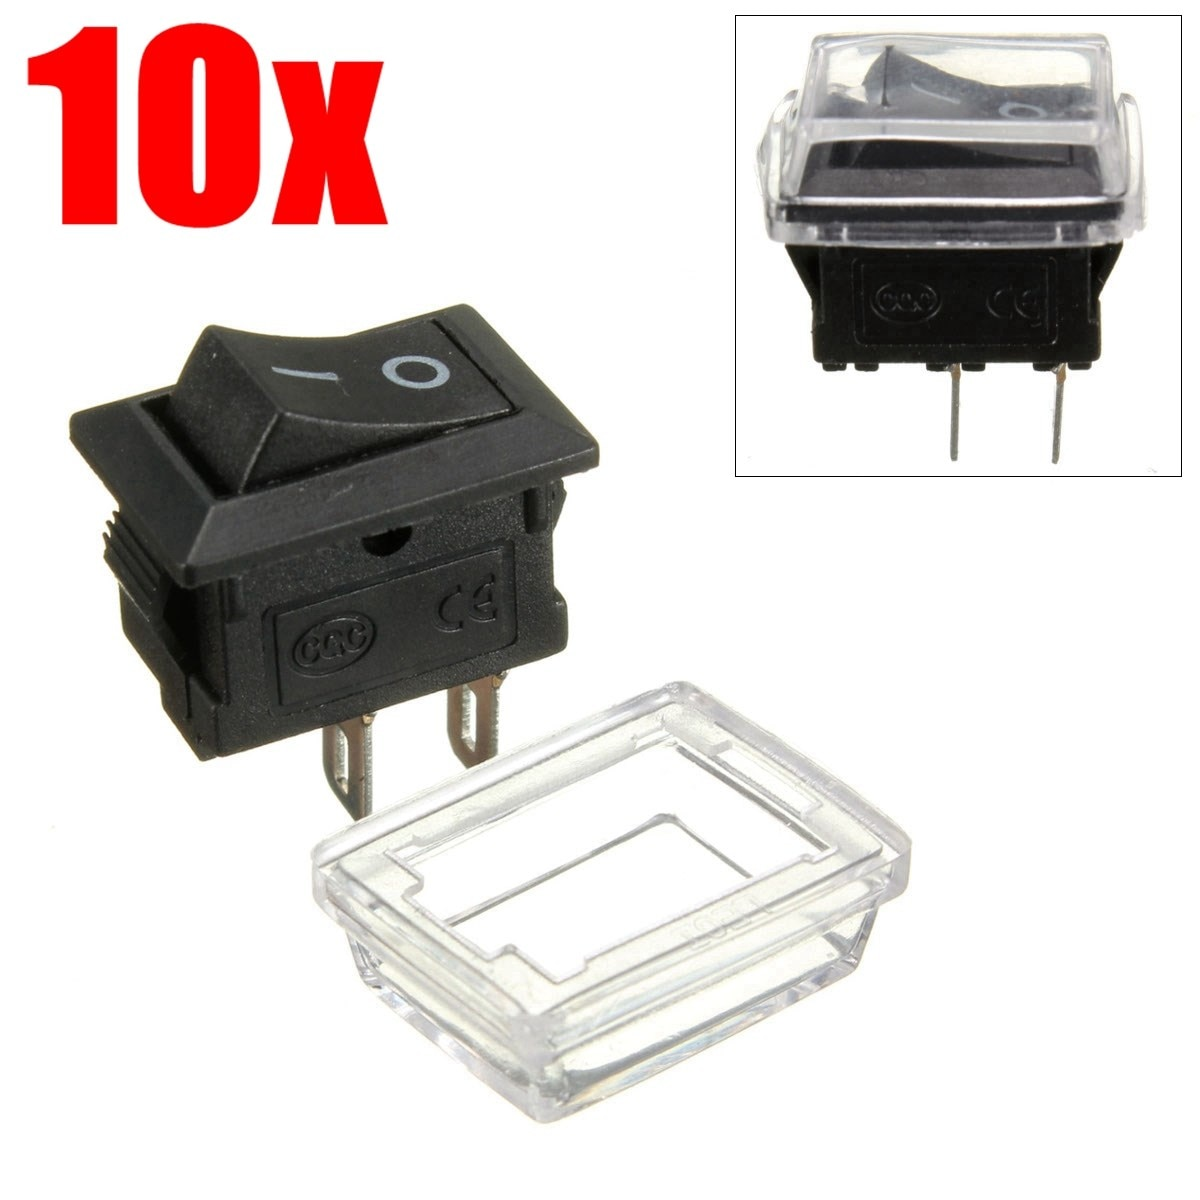 10Pcs 2Pin On/Off Waterproof Rectangle Rocker Switch w/ Cover Car Dashboard Dash Boat 6A 250VAC / 10A 125VAC